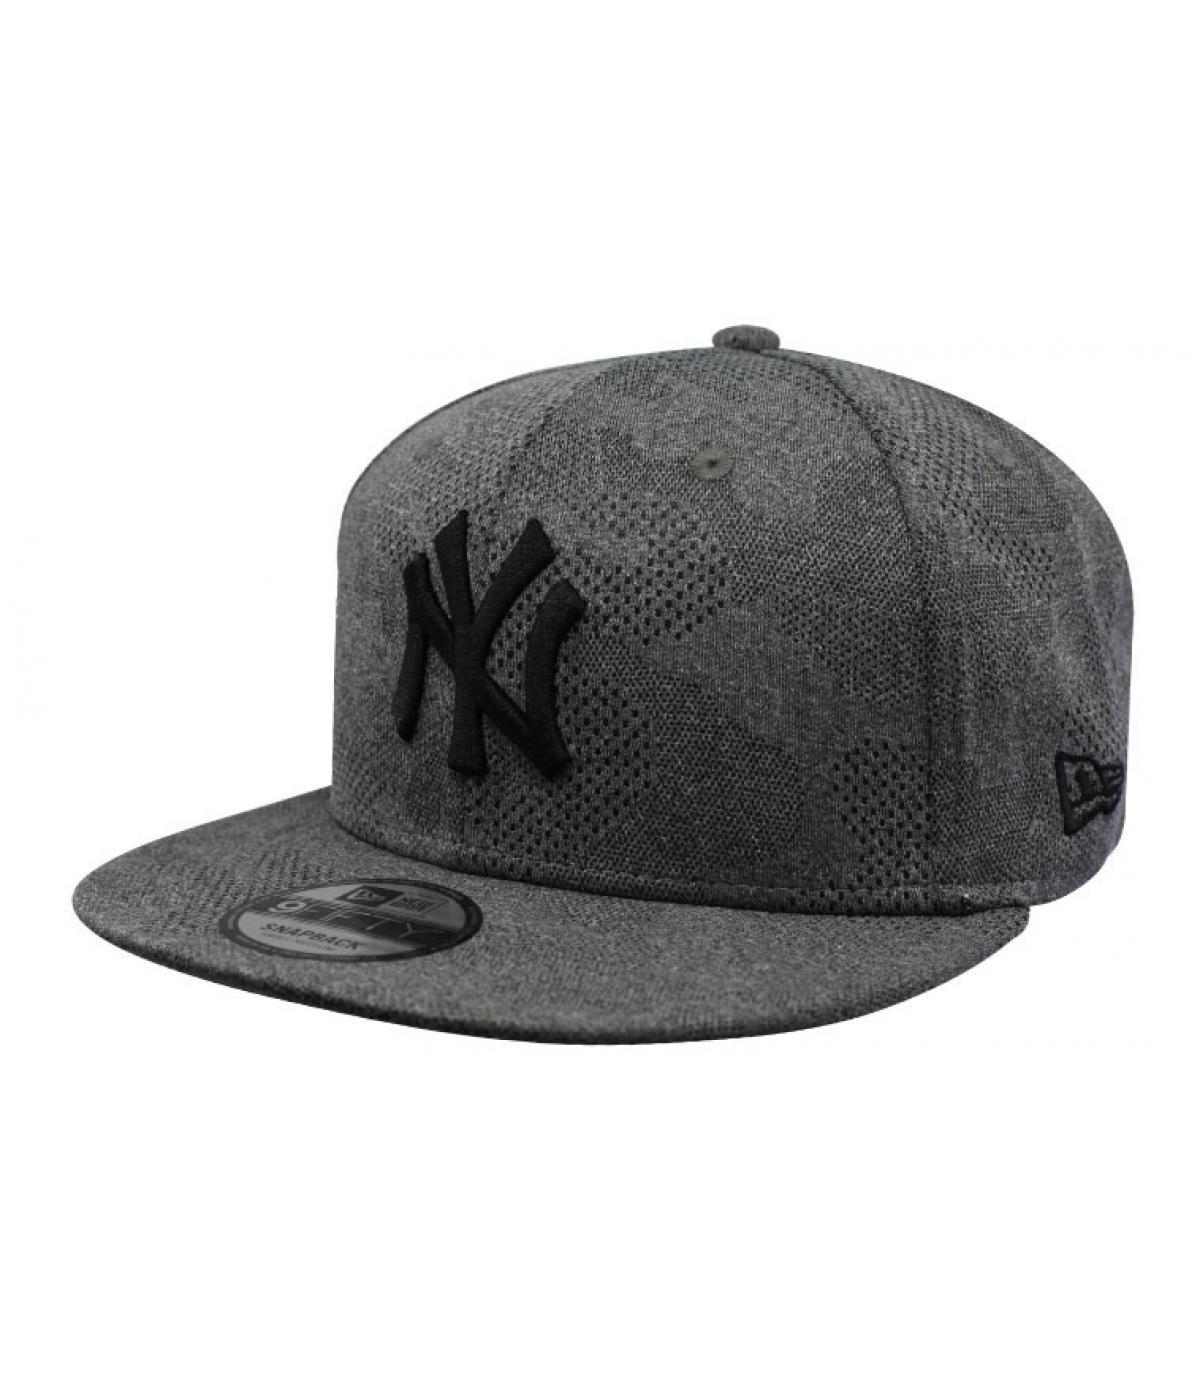 Detalles Engineered Plus NY 950 gray black imagen 2